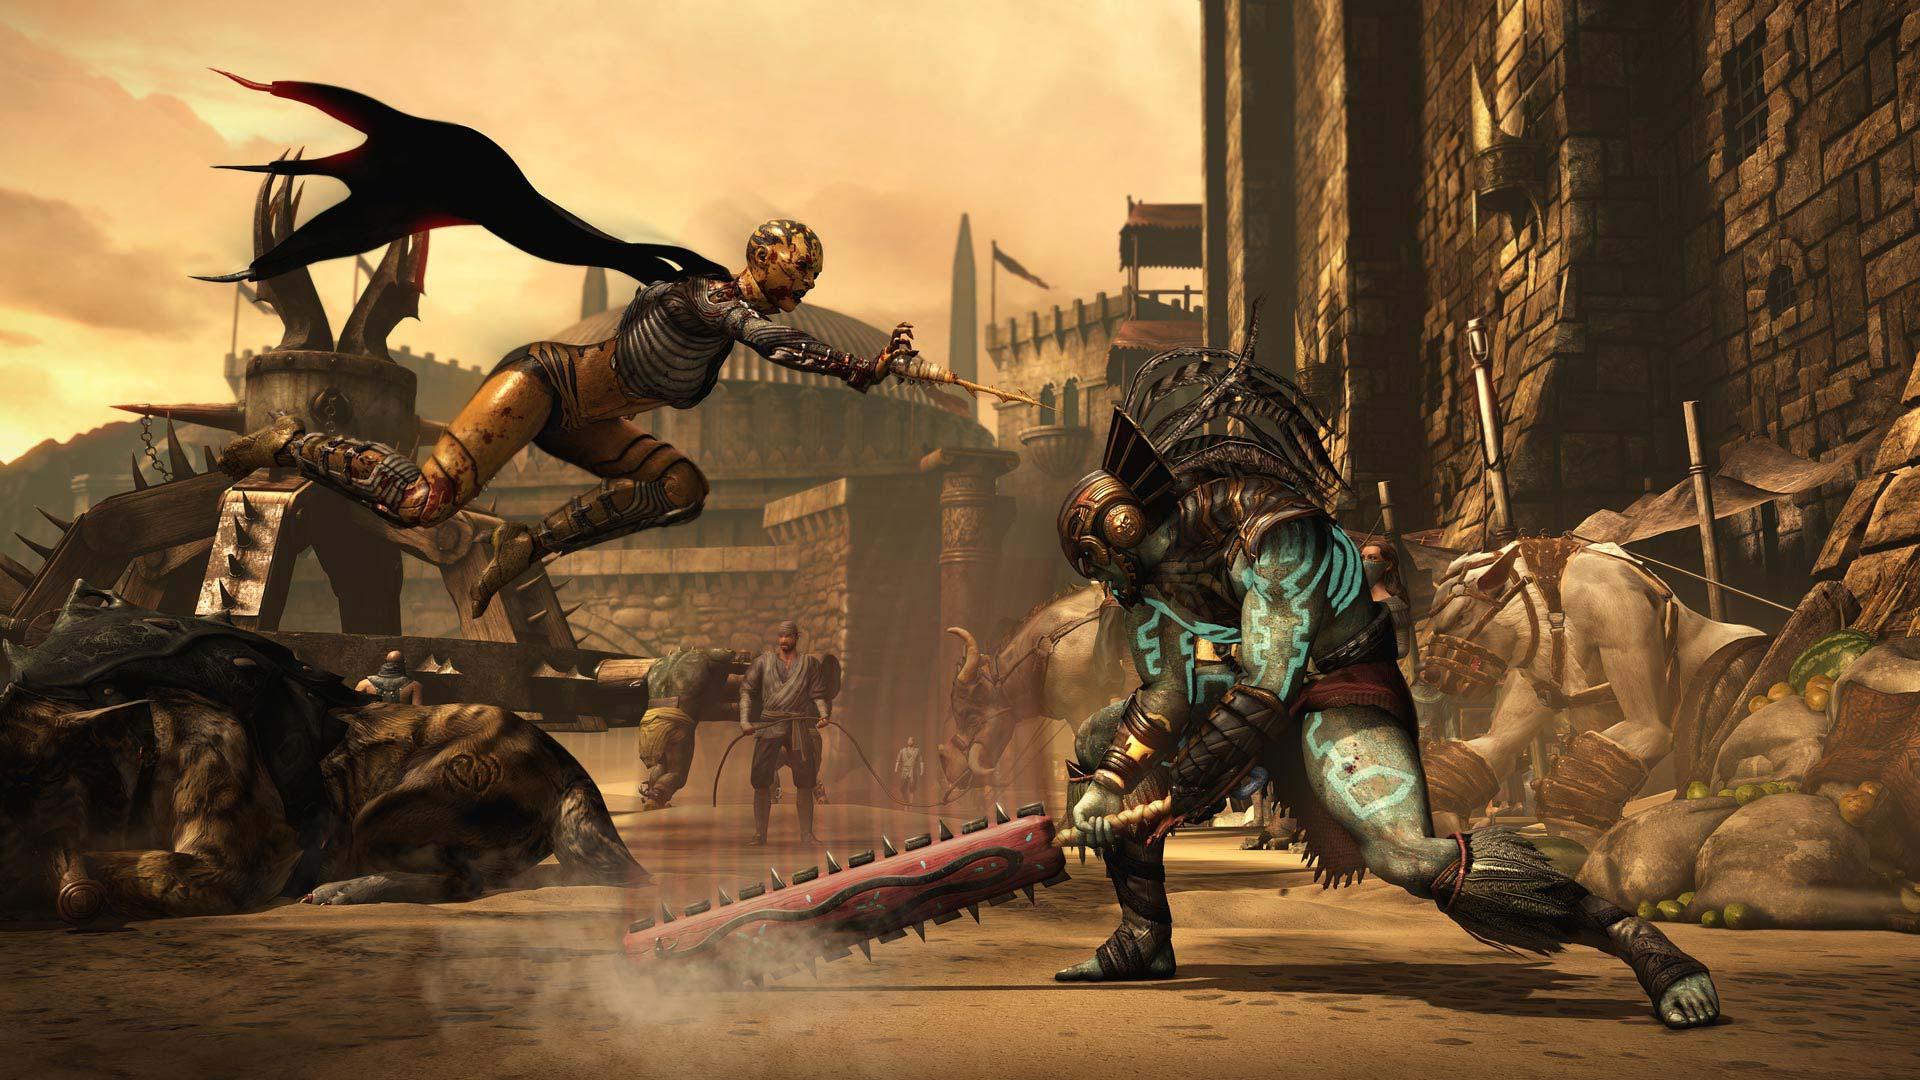 Mortal Kombat X Screenshot 2